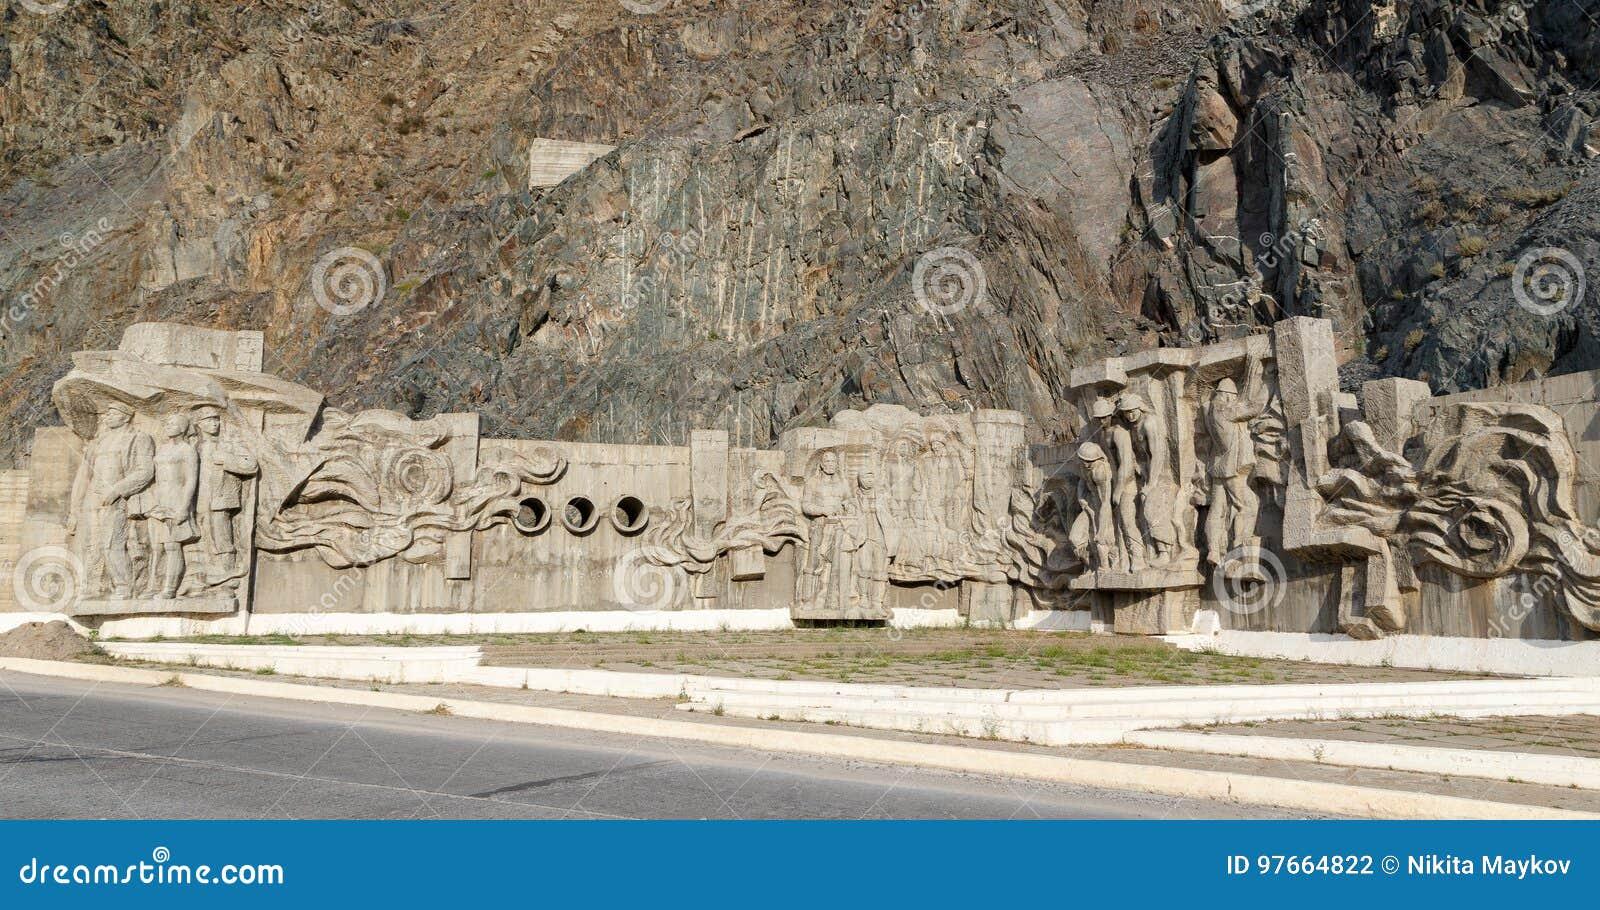 Bas builders Kirov reservoir dam. Built 1965 - 1975. Valley Ta